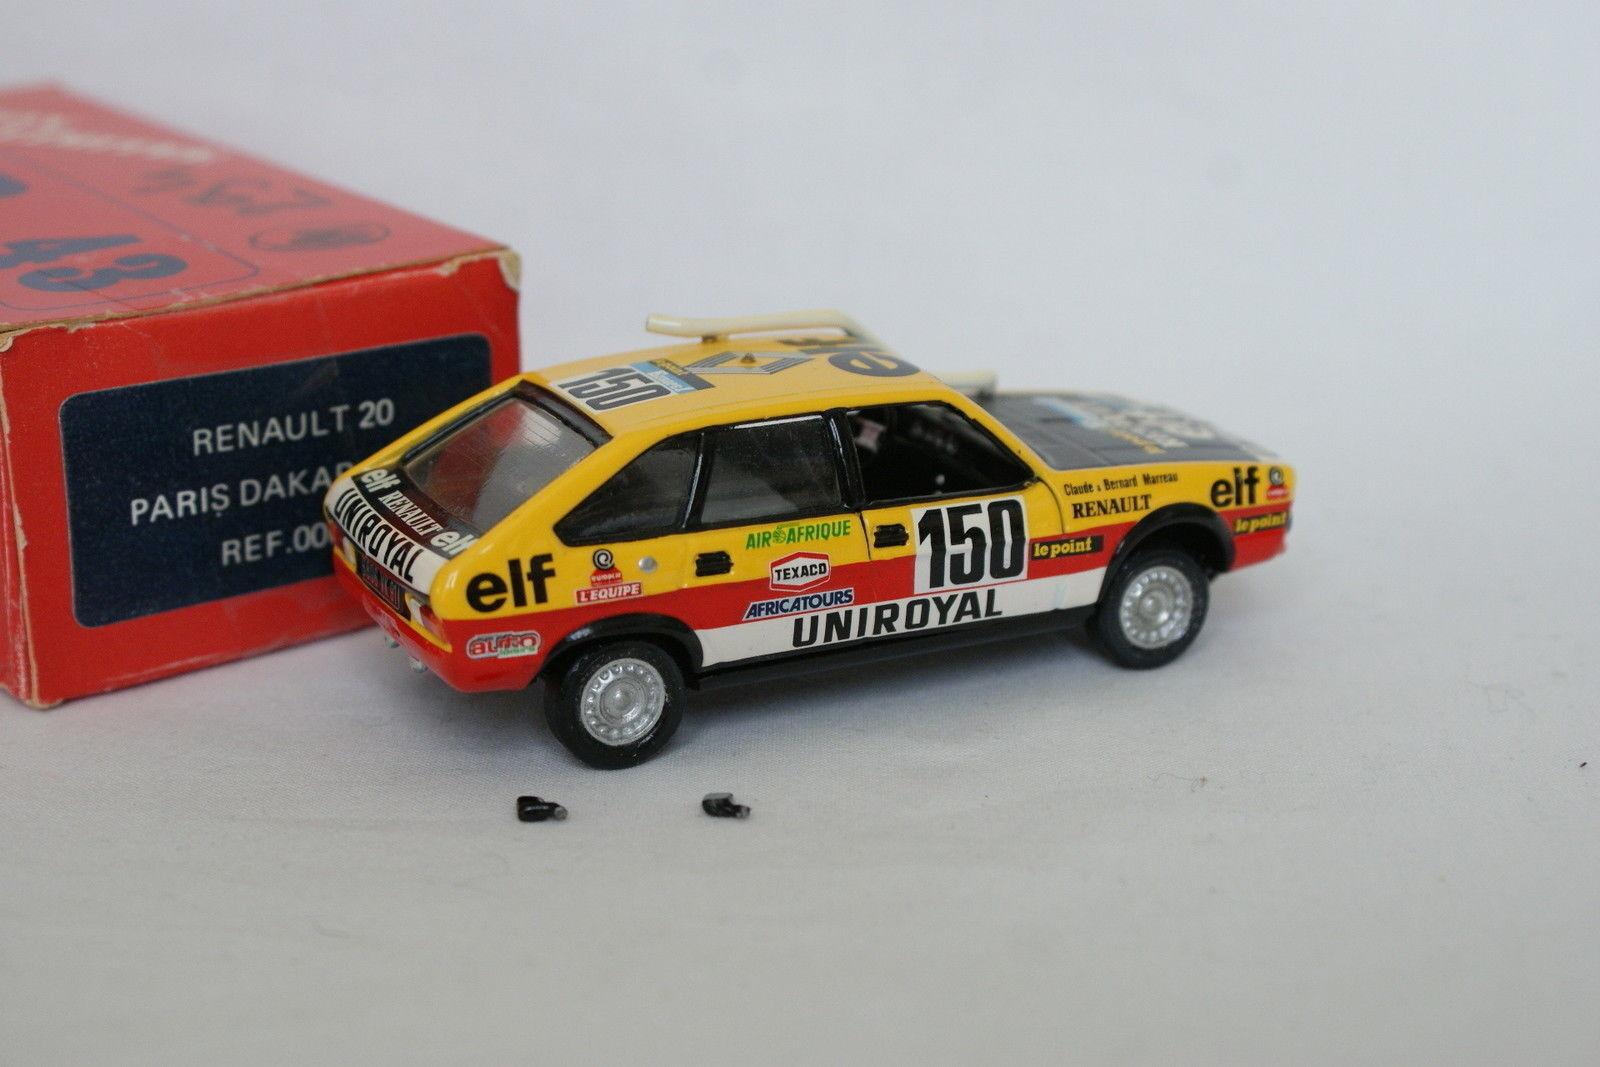 Top 43 Kit montado 1 43 - Renault 20 20 20 París Dakar 1982 Marreau fe1df0